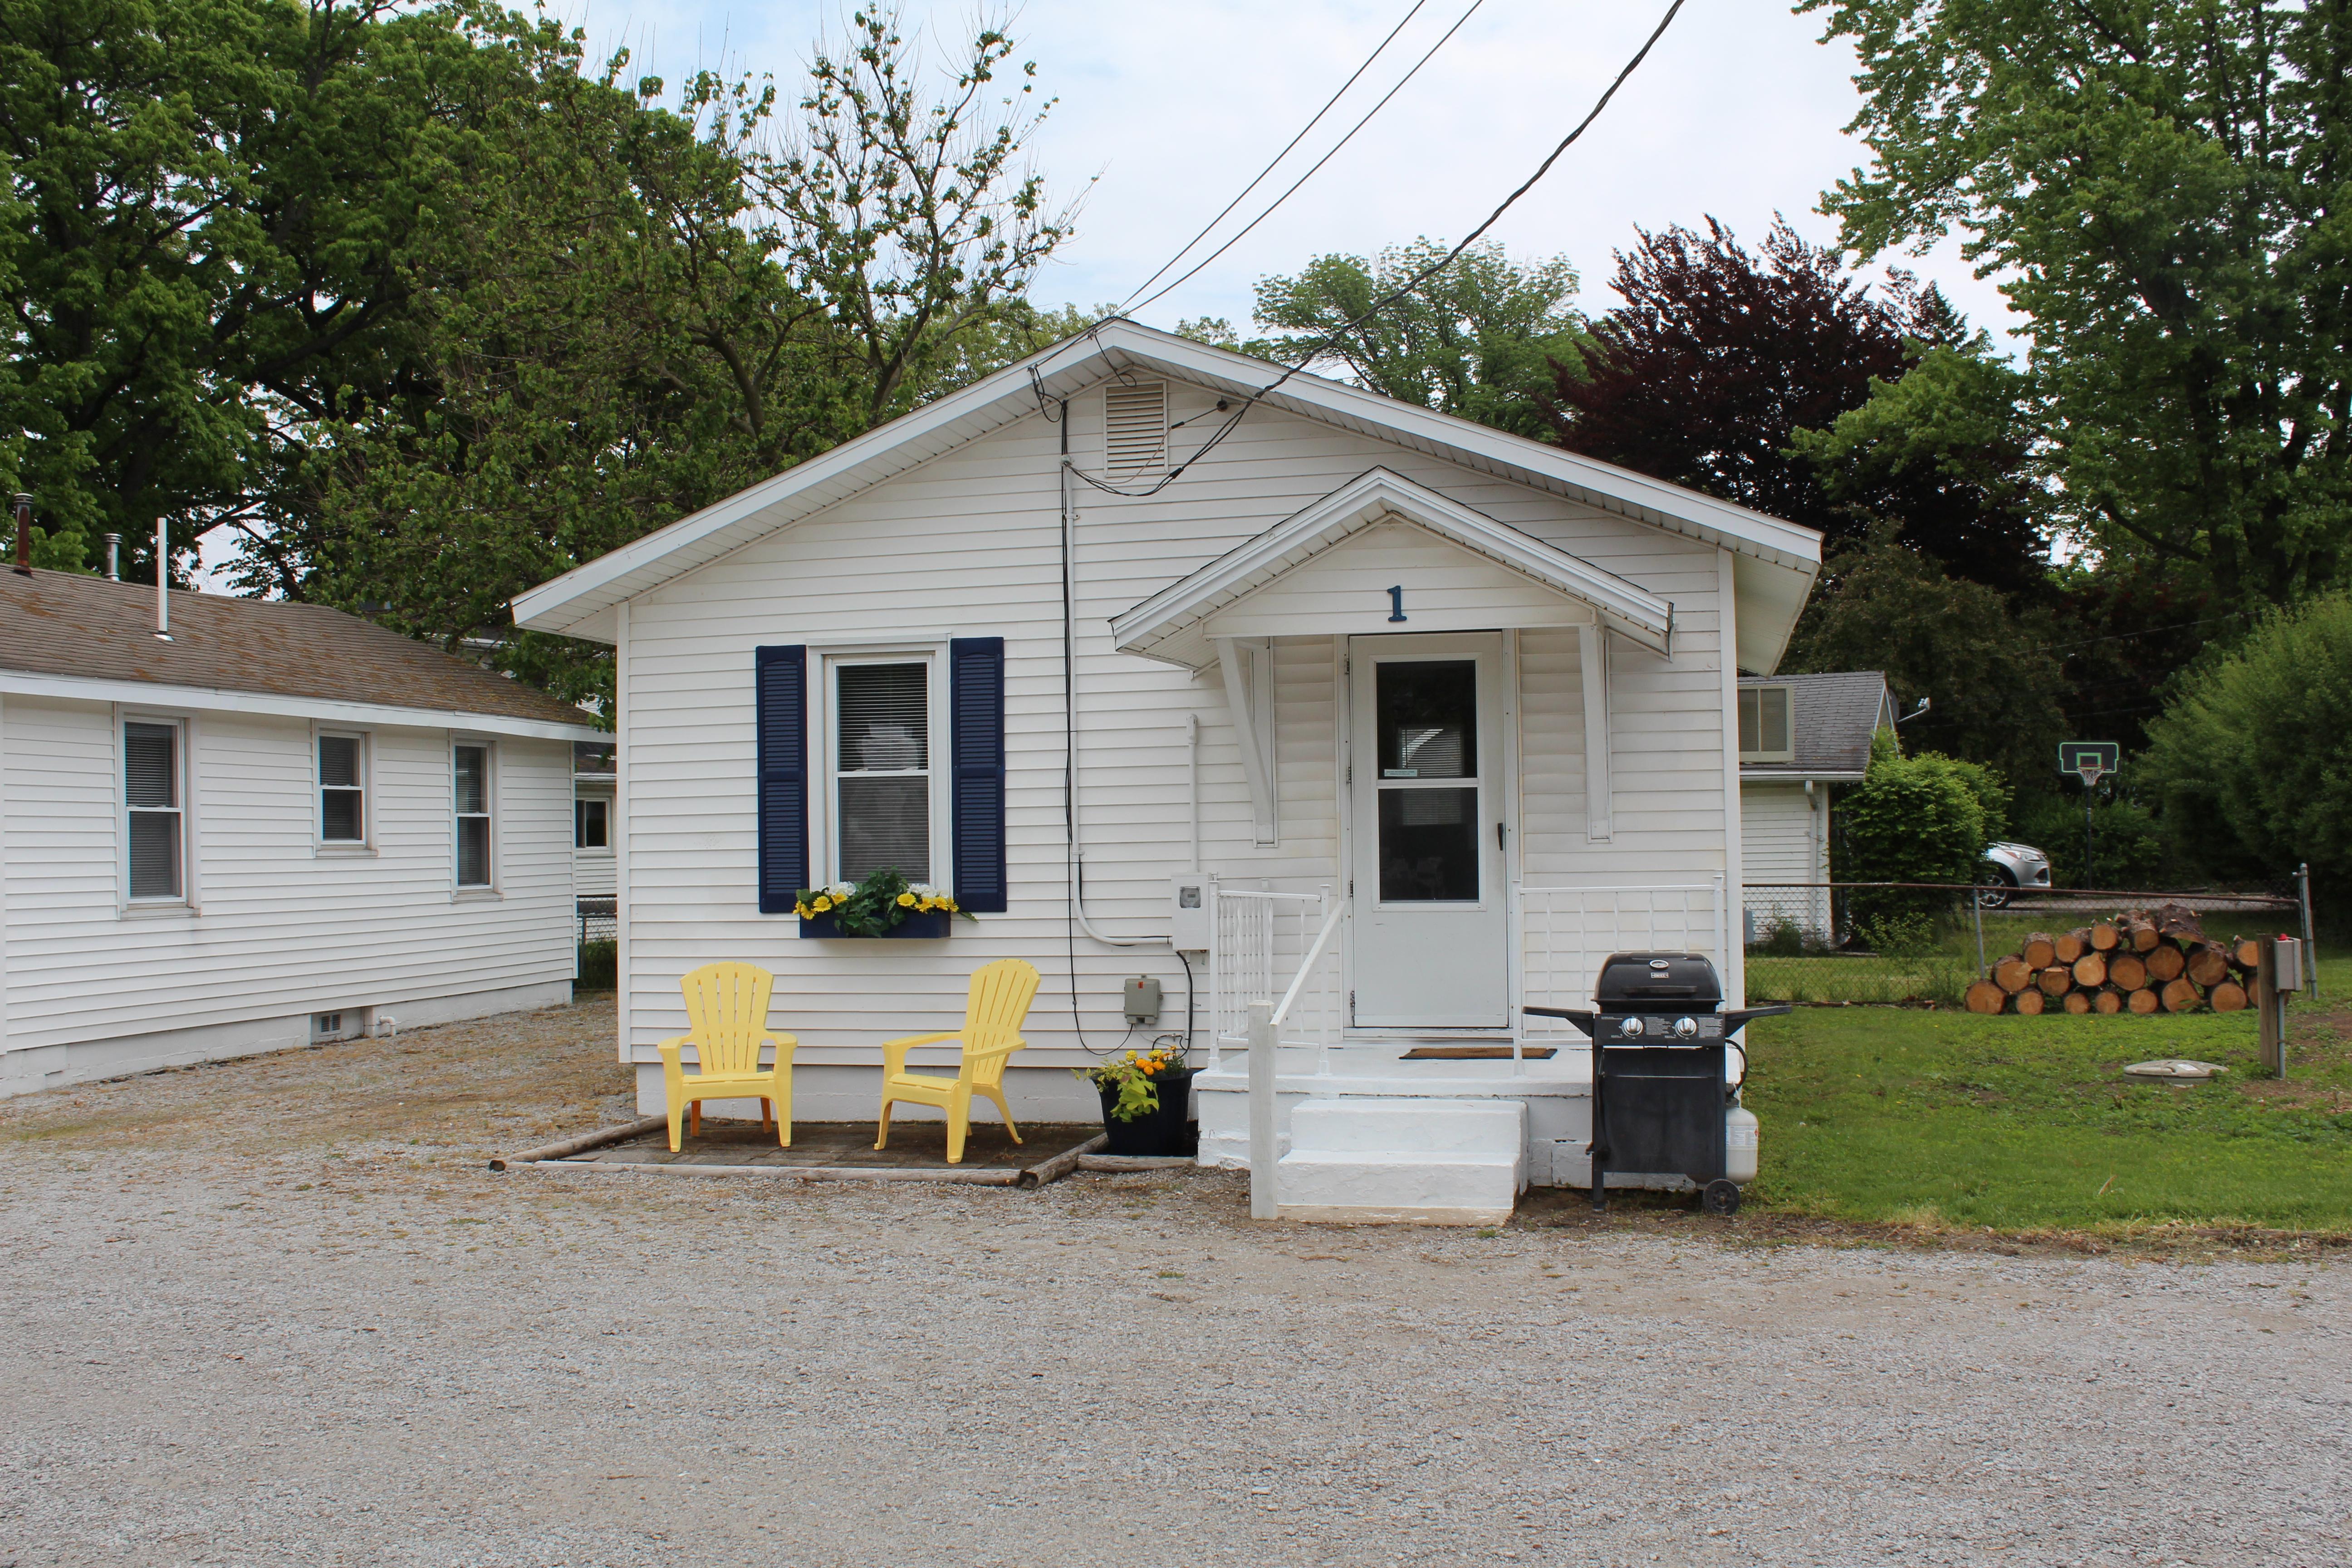 Cottage #1